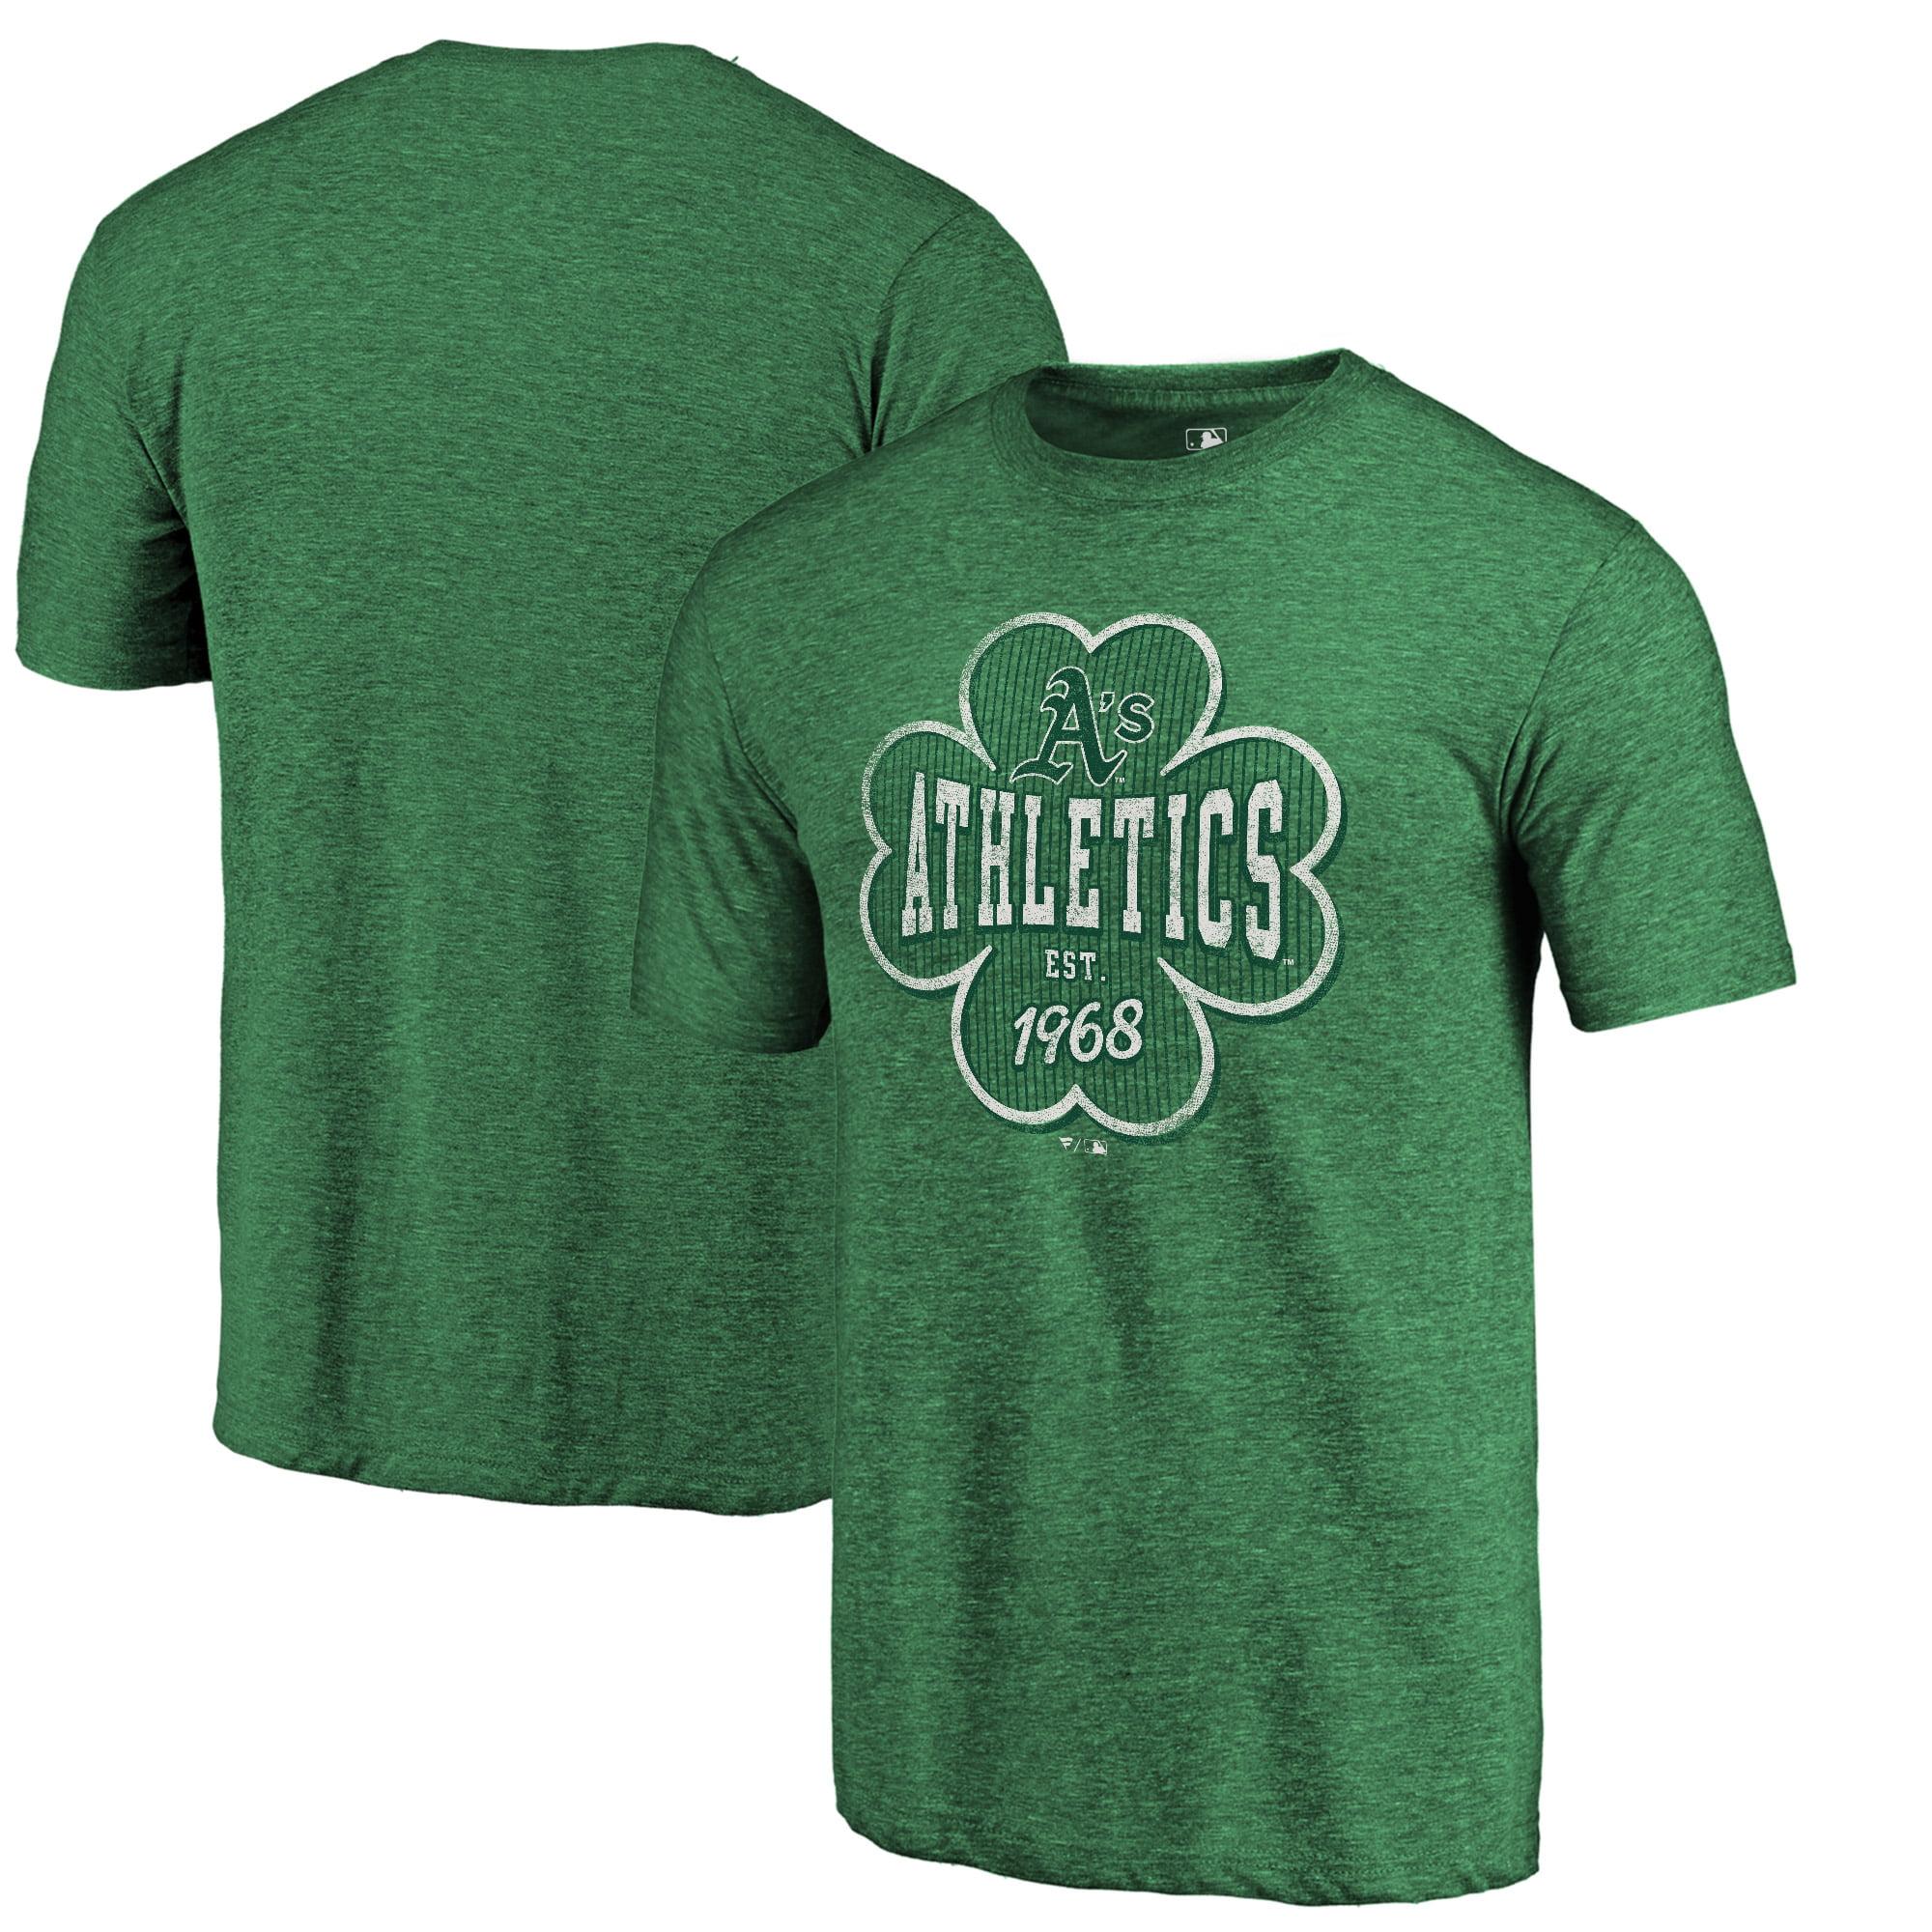 Oakland Athletics Fanatics Branded 2018 St. Patrick's Day Emerald Isle Tri-Blend T-Shirt - Kelly Green